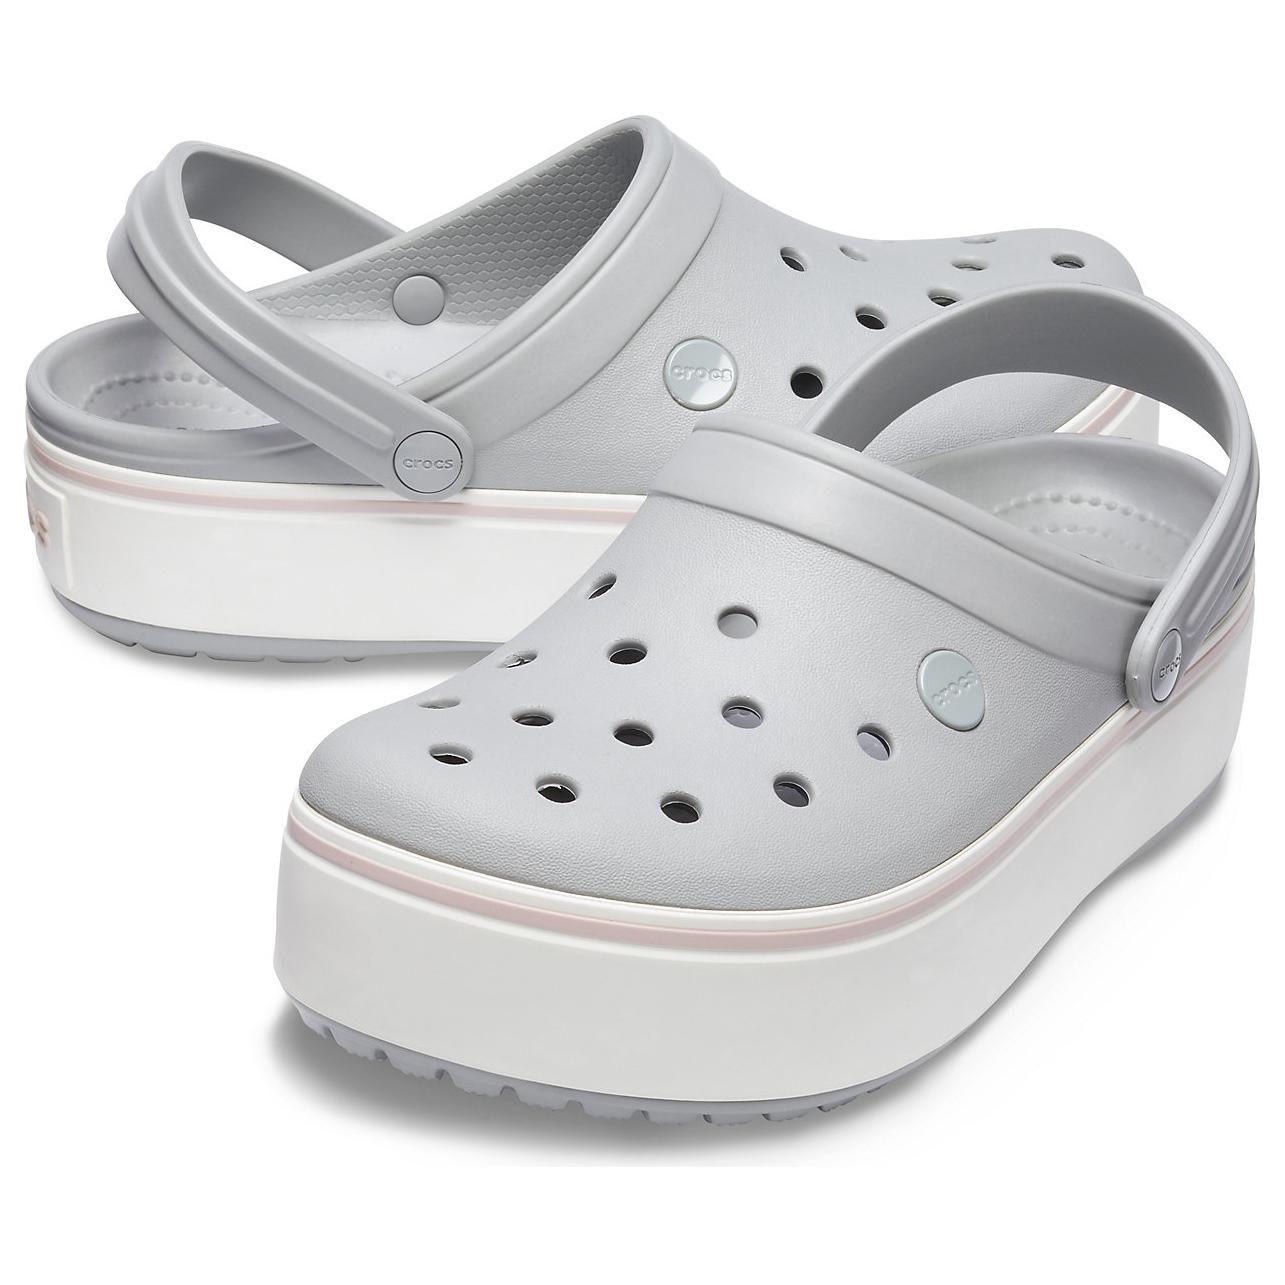 88aee44e4d84cb Crocs - Women s Crocband Platform Clog - Sandals ...